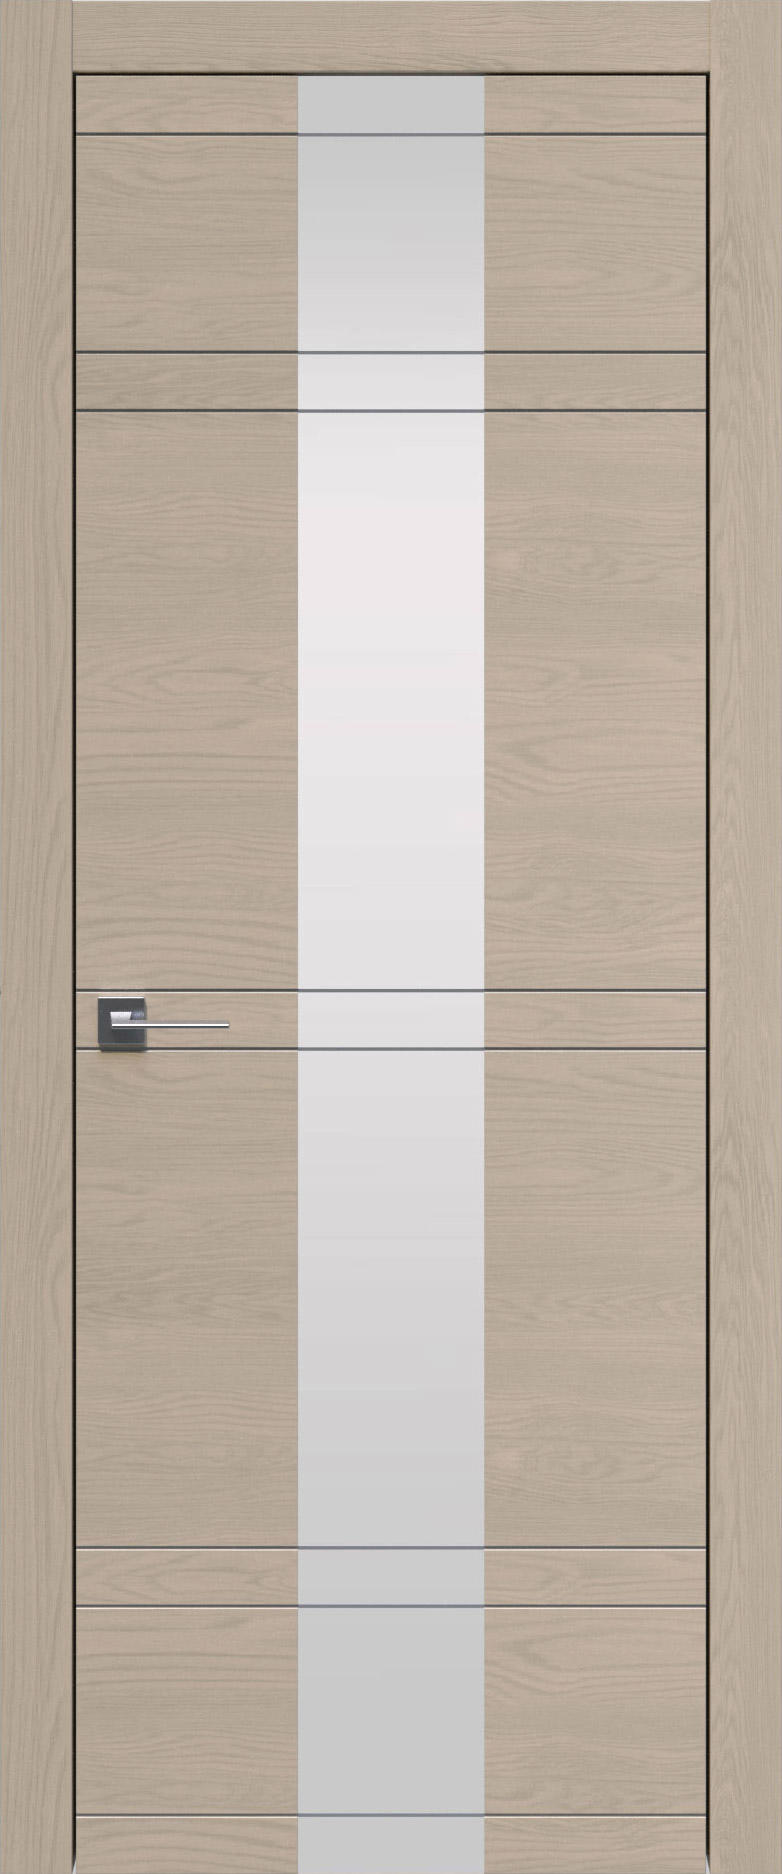 Tivoli Ж-4 цвет - Дуб муар Со стеклом (ДО)